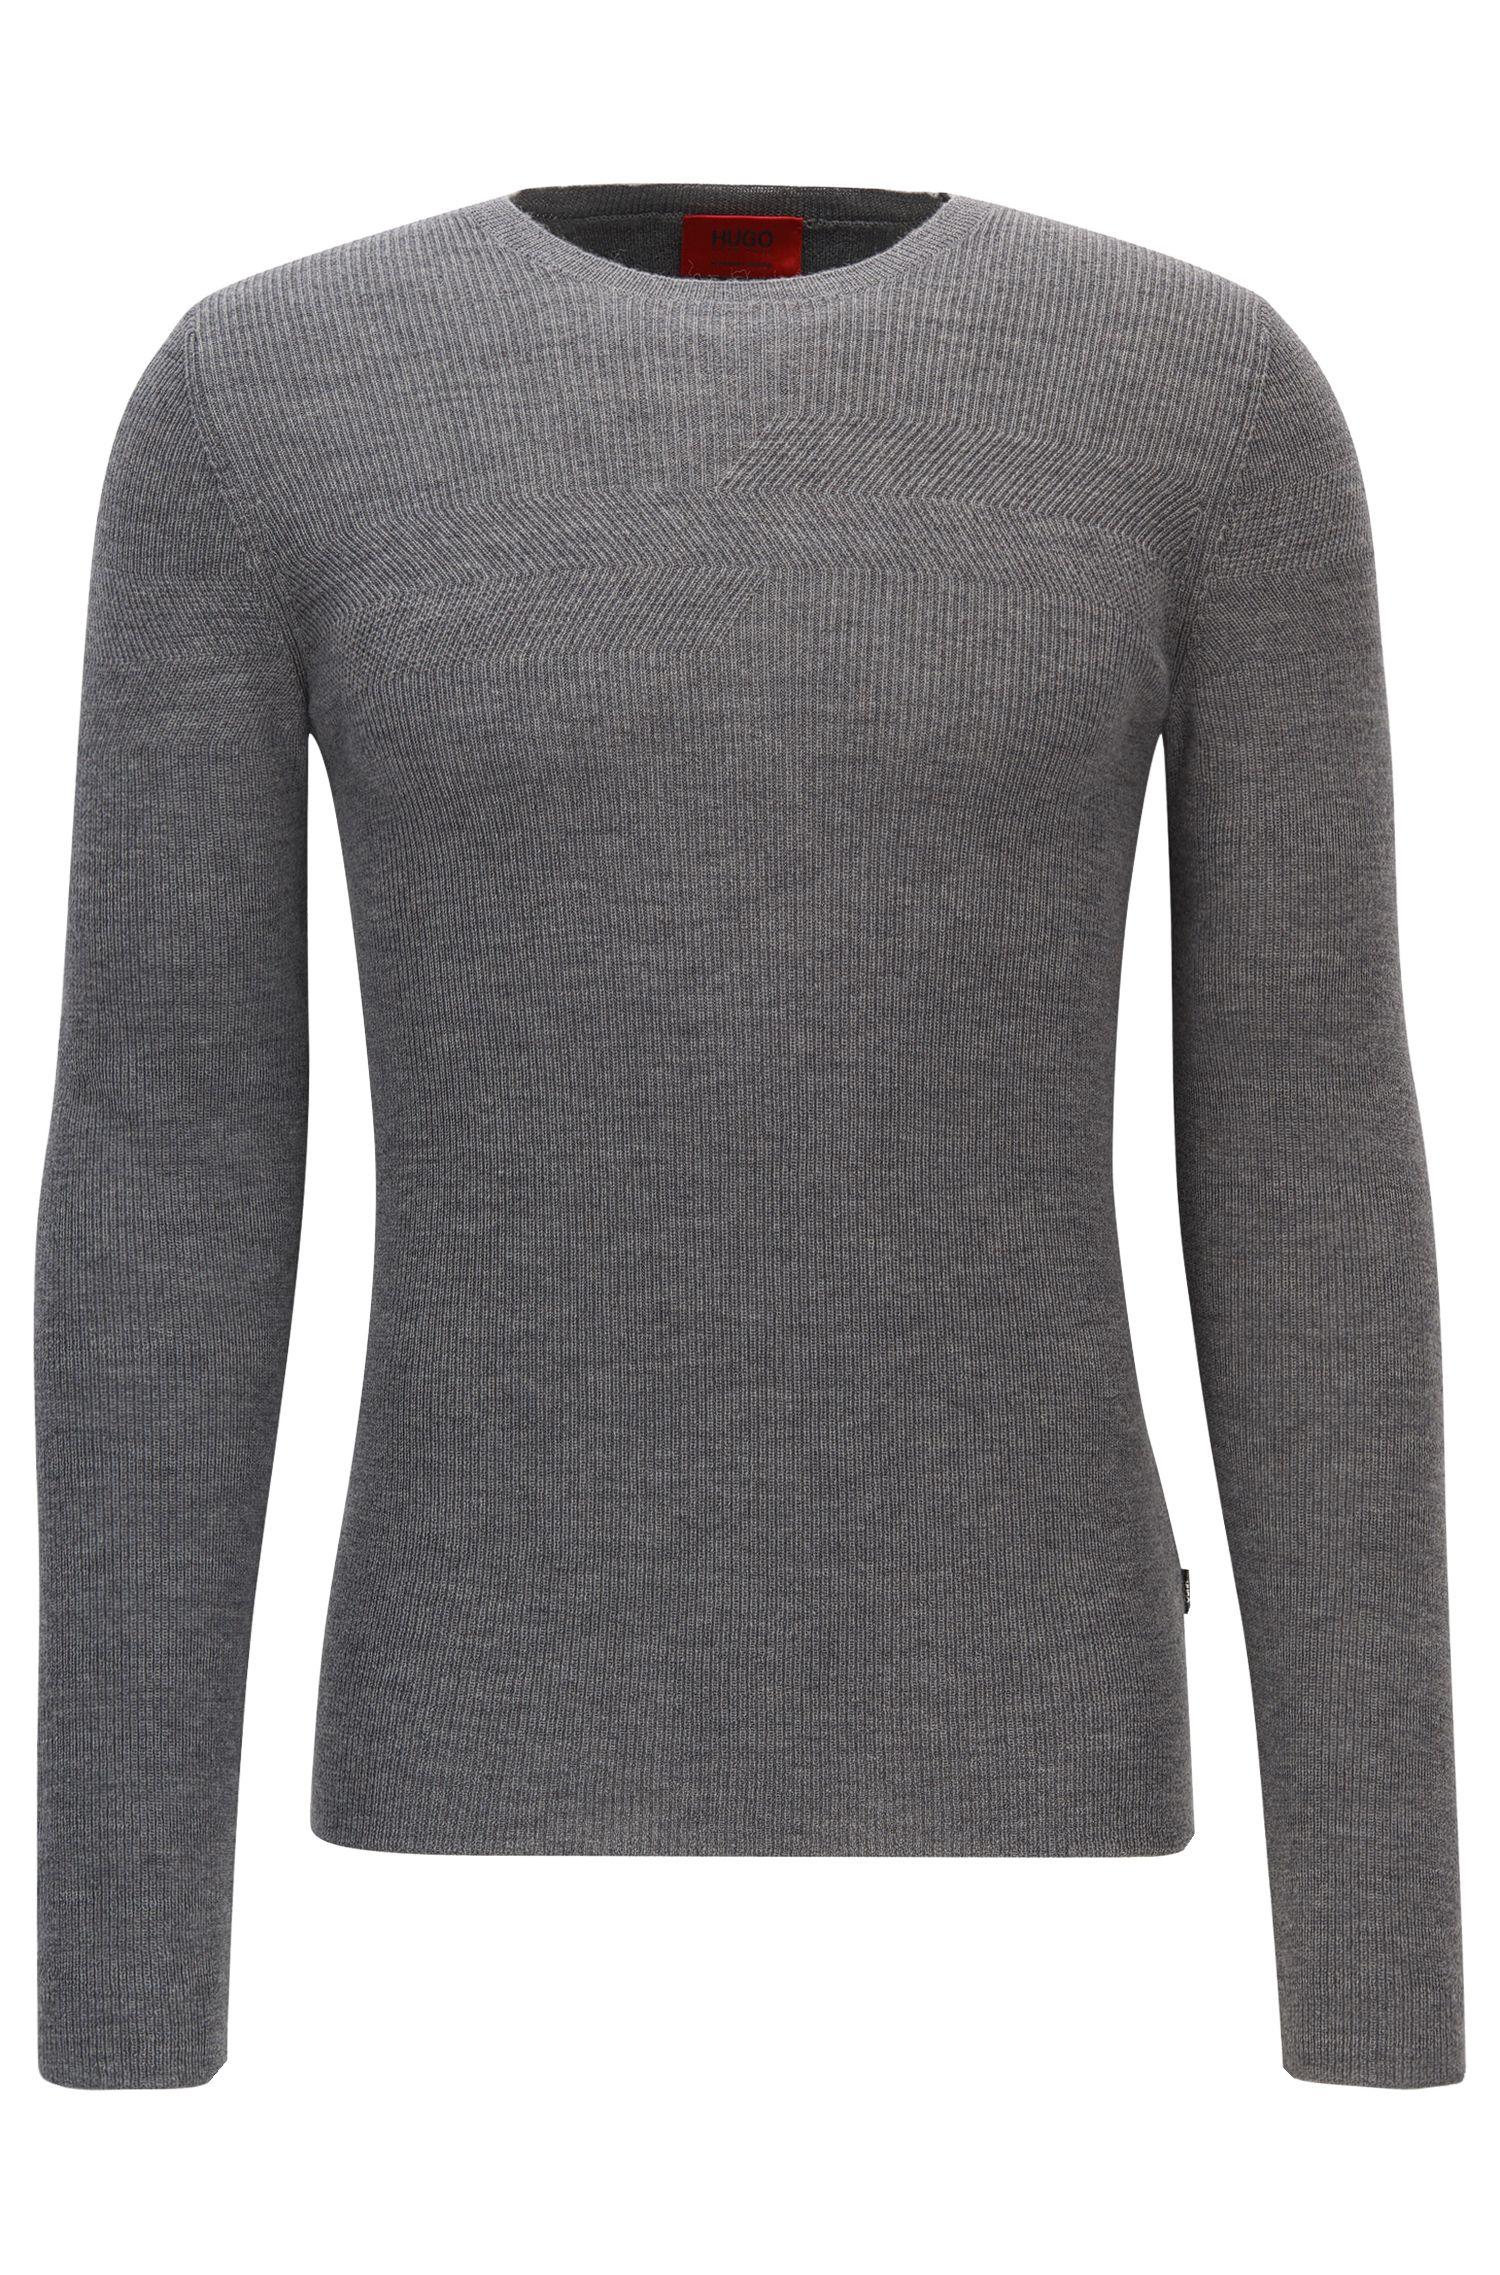 Ribbed Virgin Wool Sweater | Sarow